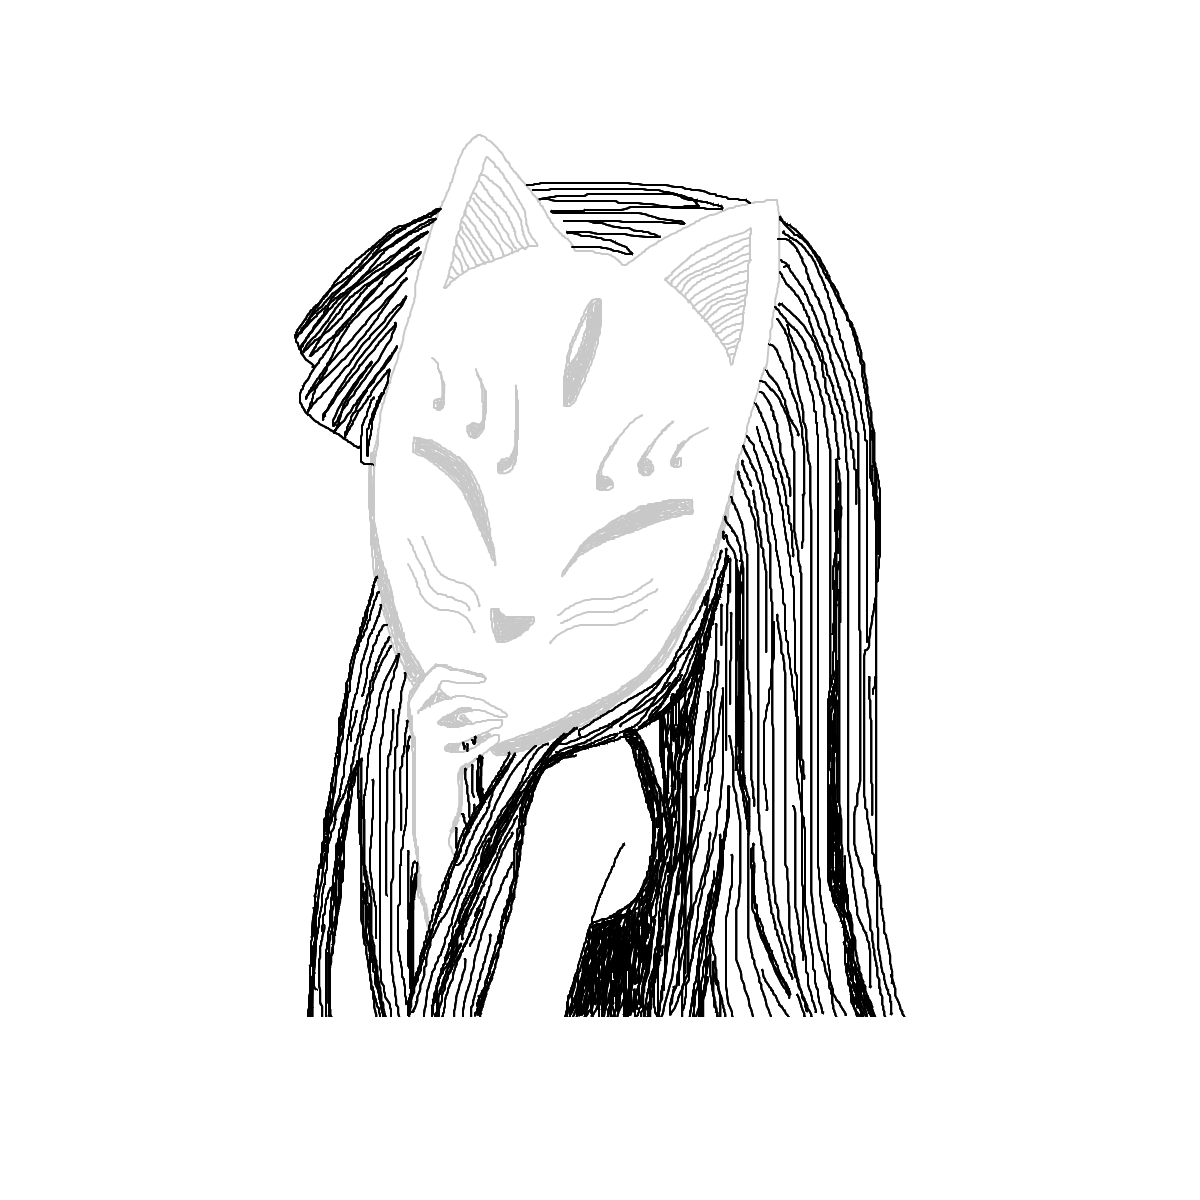 BAAAM drawing#23152 lat:45.7348022460937500lng: 4.9028749465942380